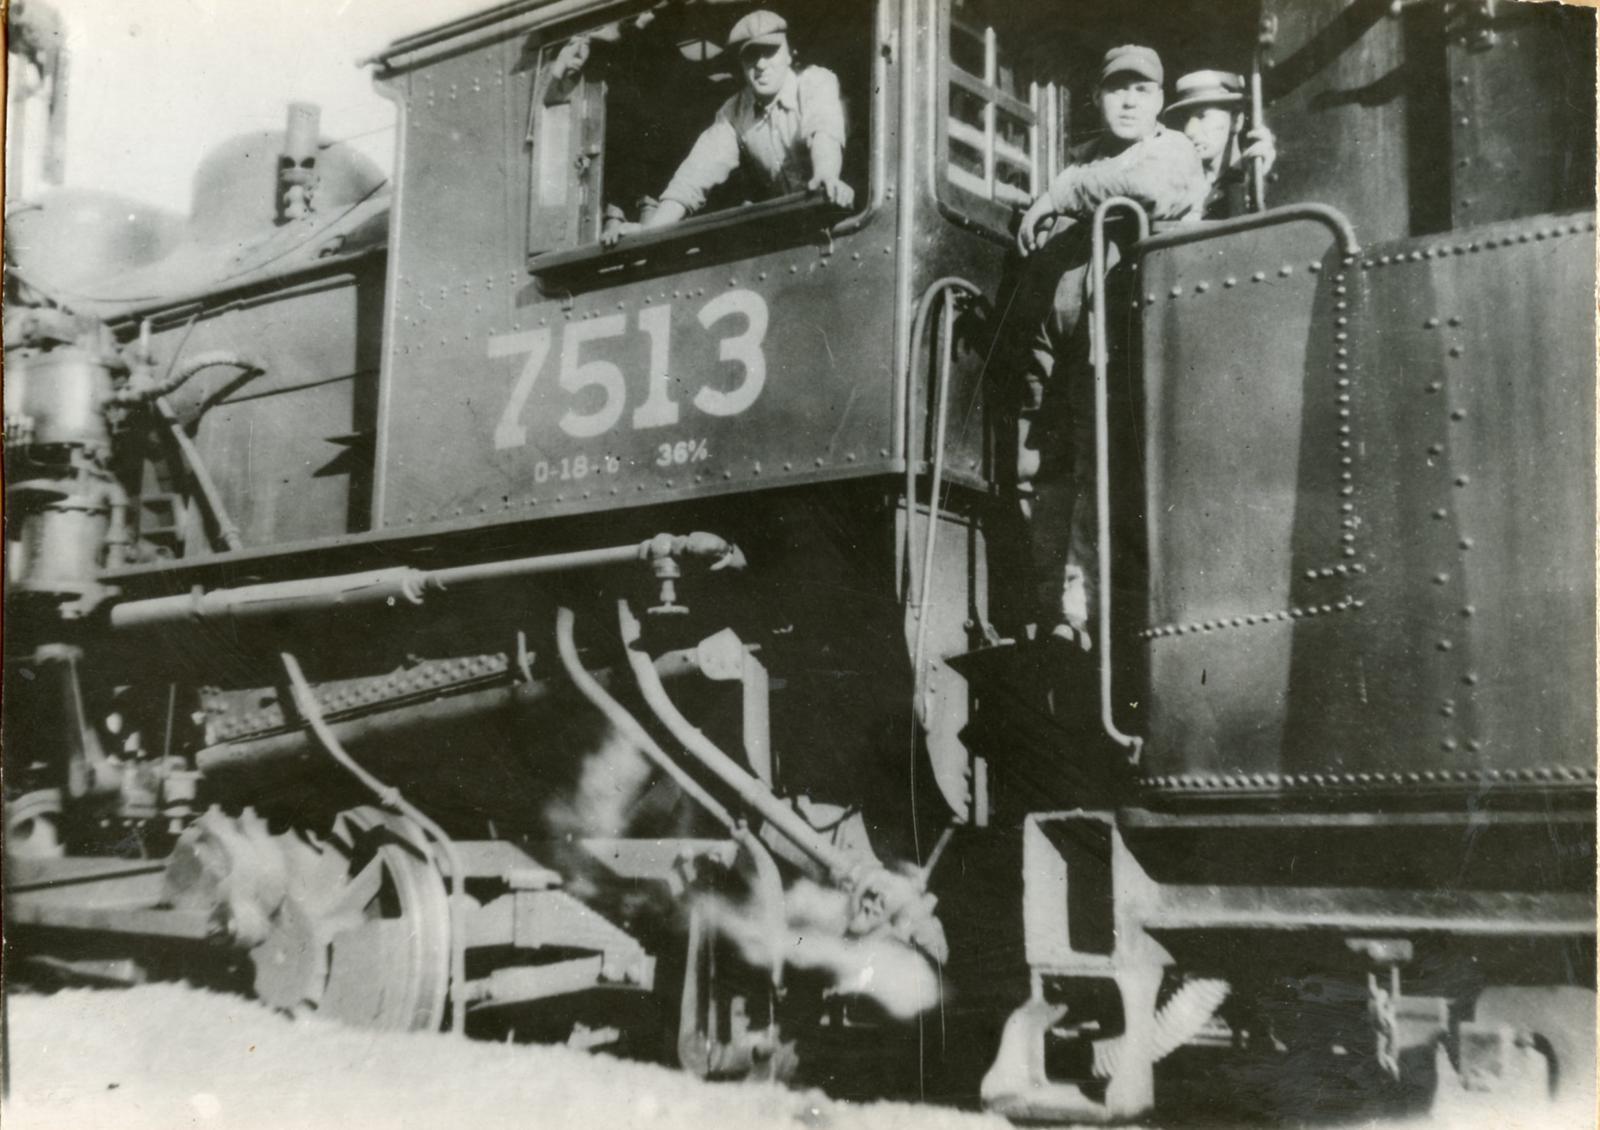 Engine 7513